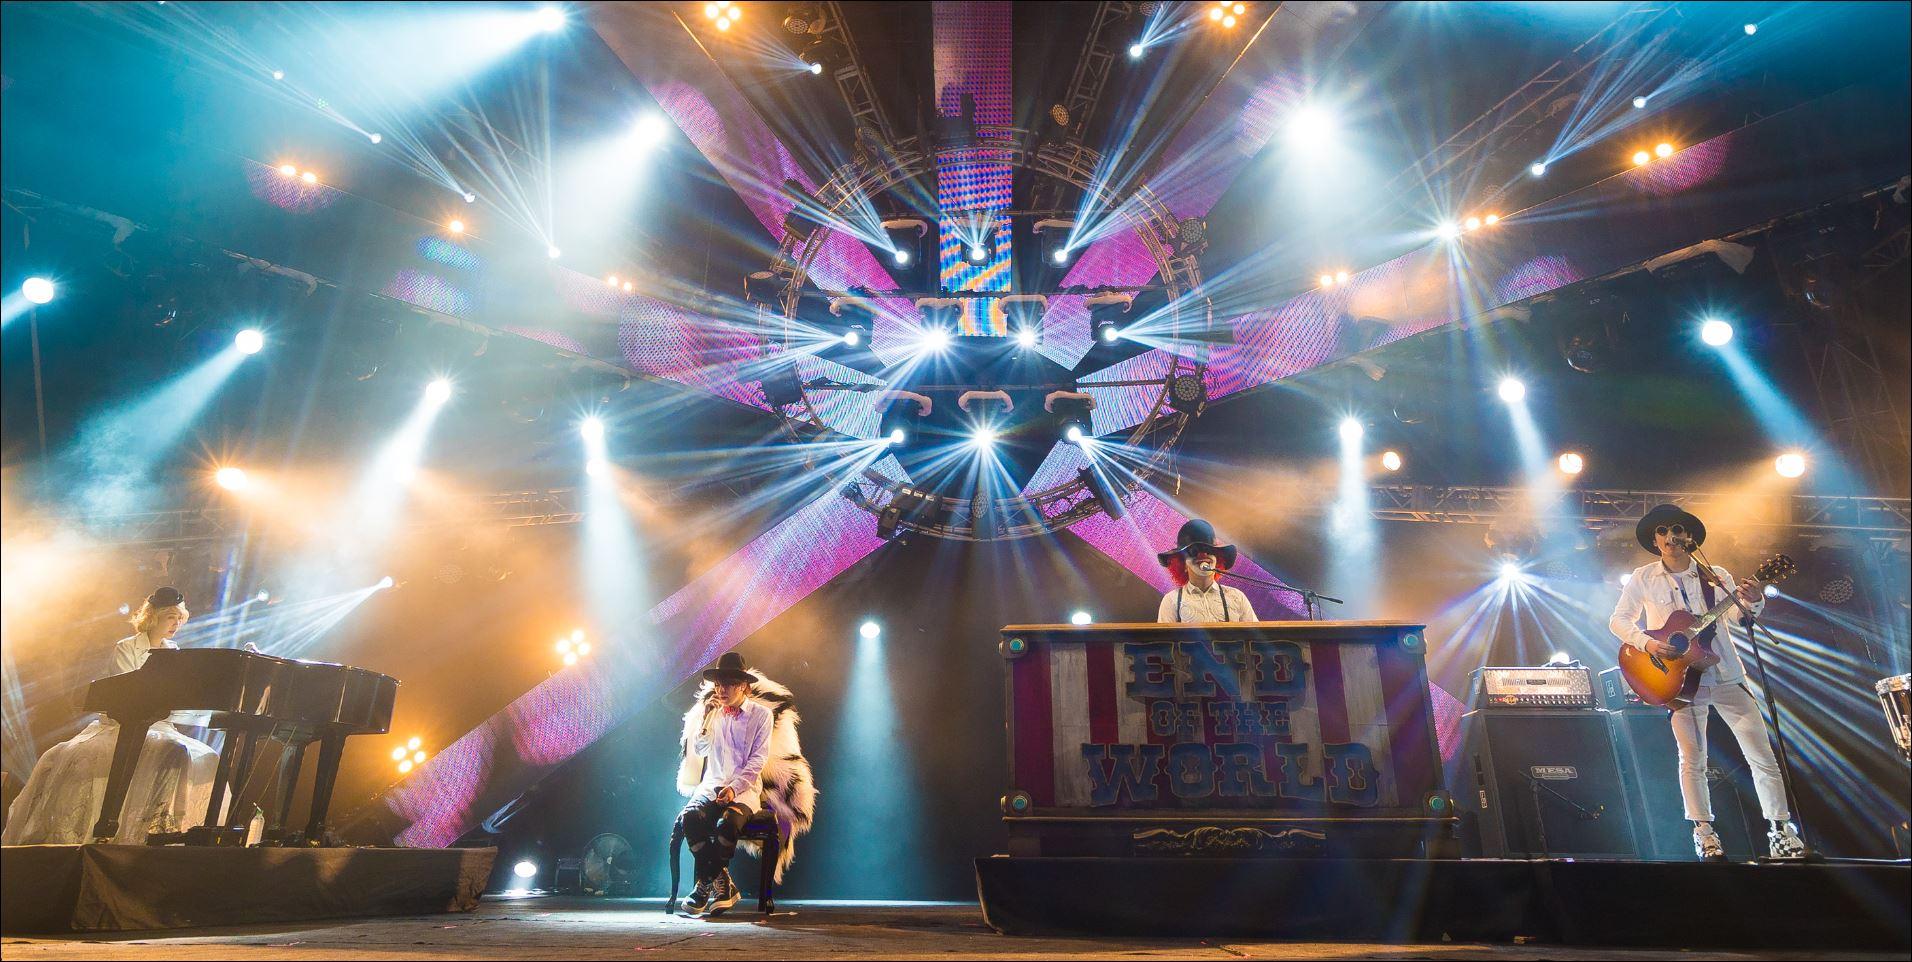 JRock247-Sekai-No-Owari-MTV-World-Stage-Malaysia-C